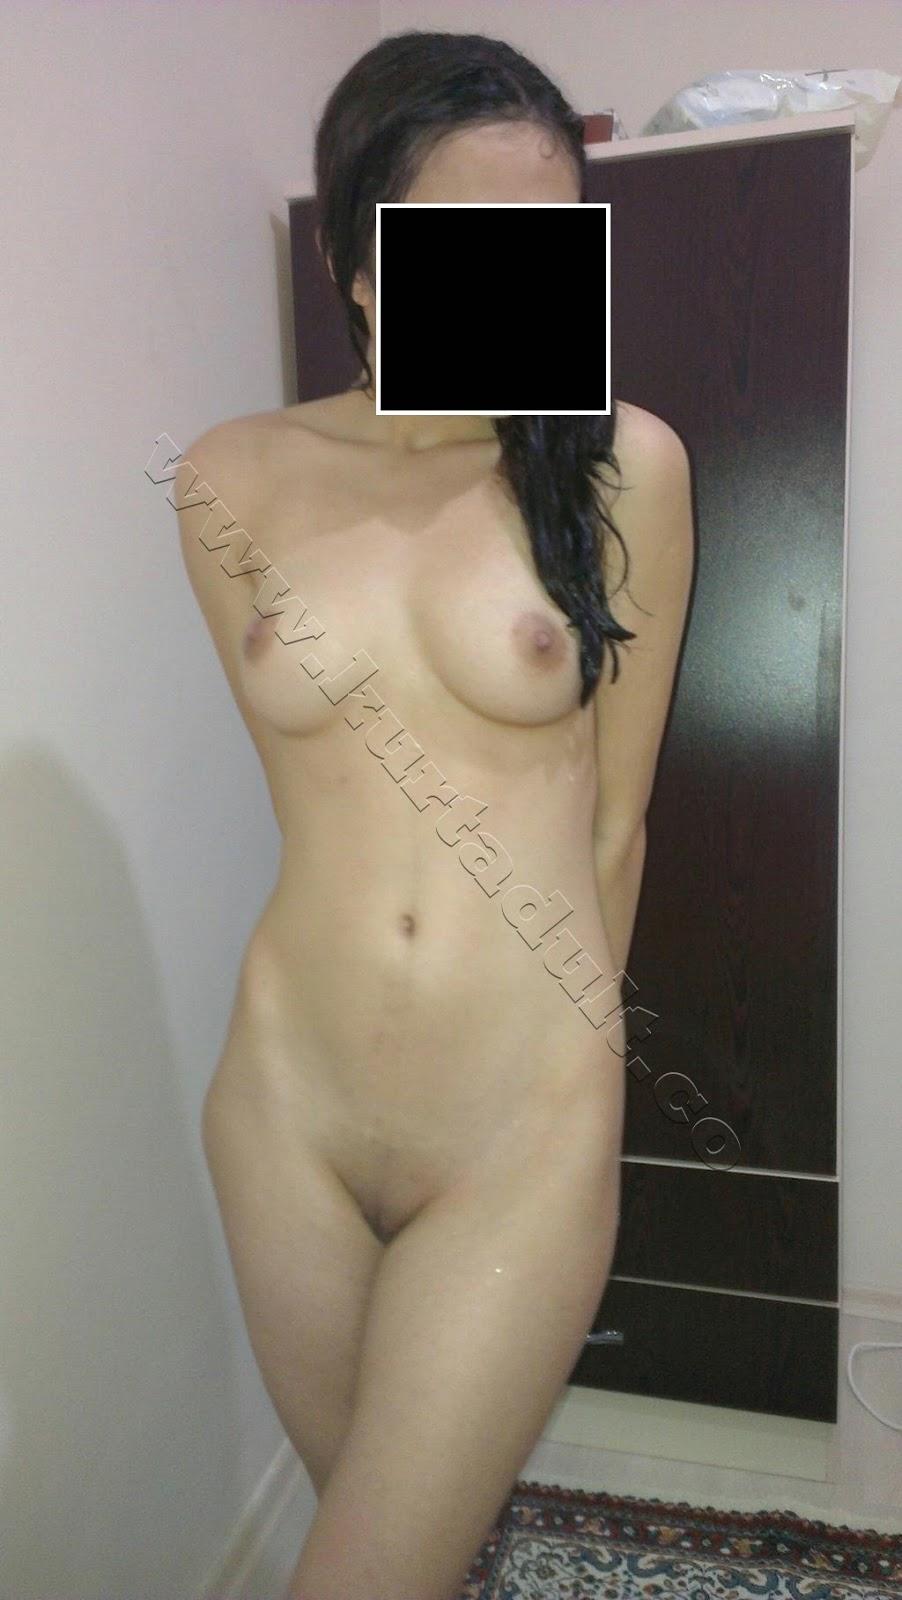 ev pornosu  Porno izle Sikiş izle Porno Sikiş Sex